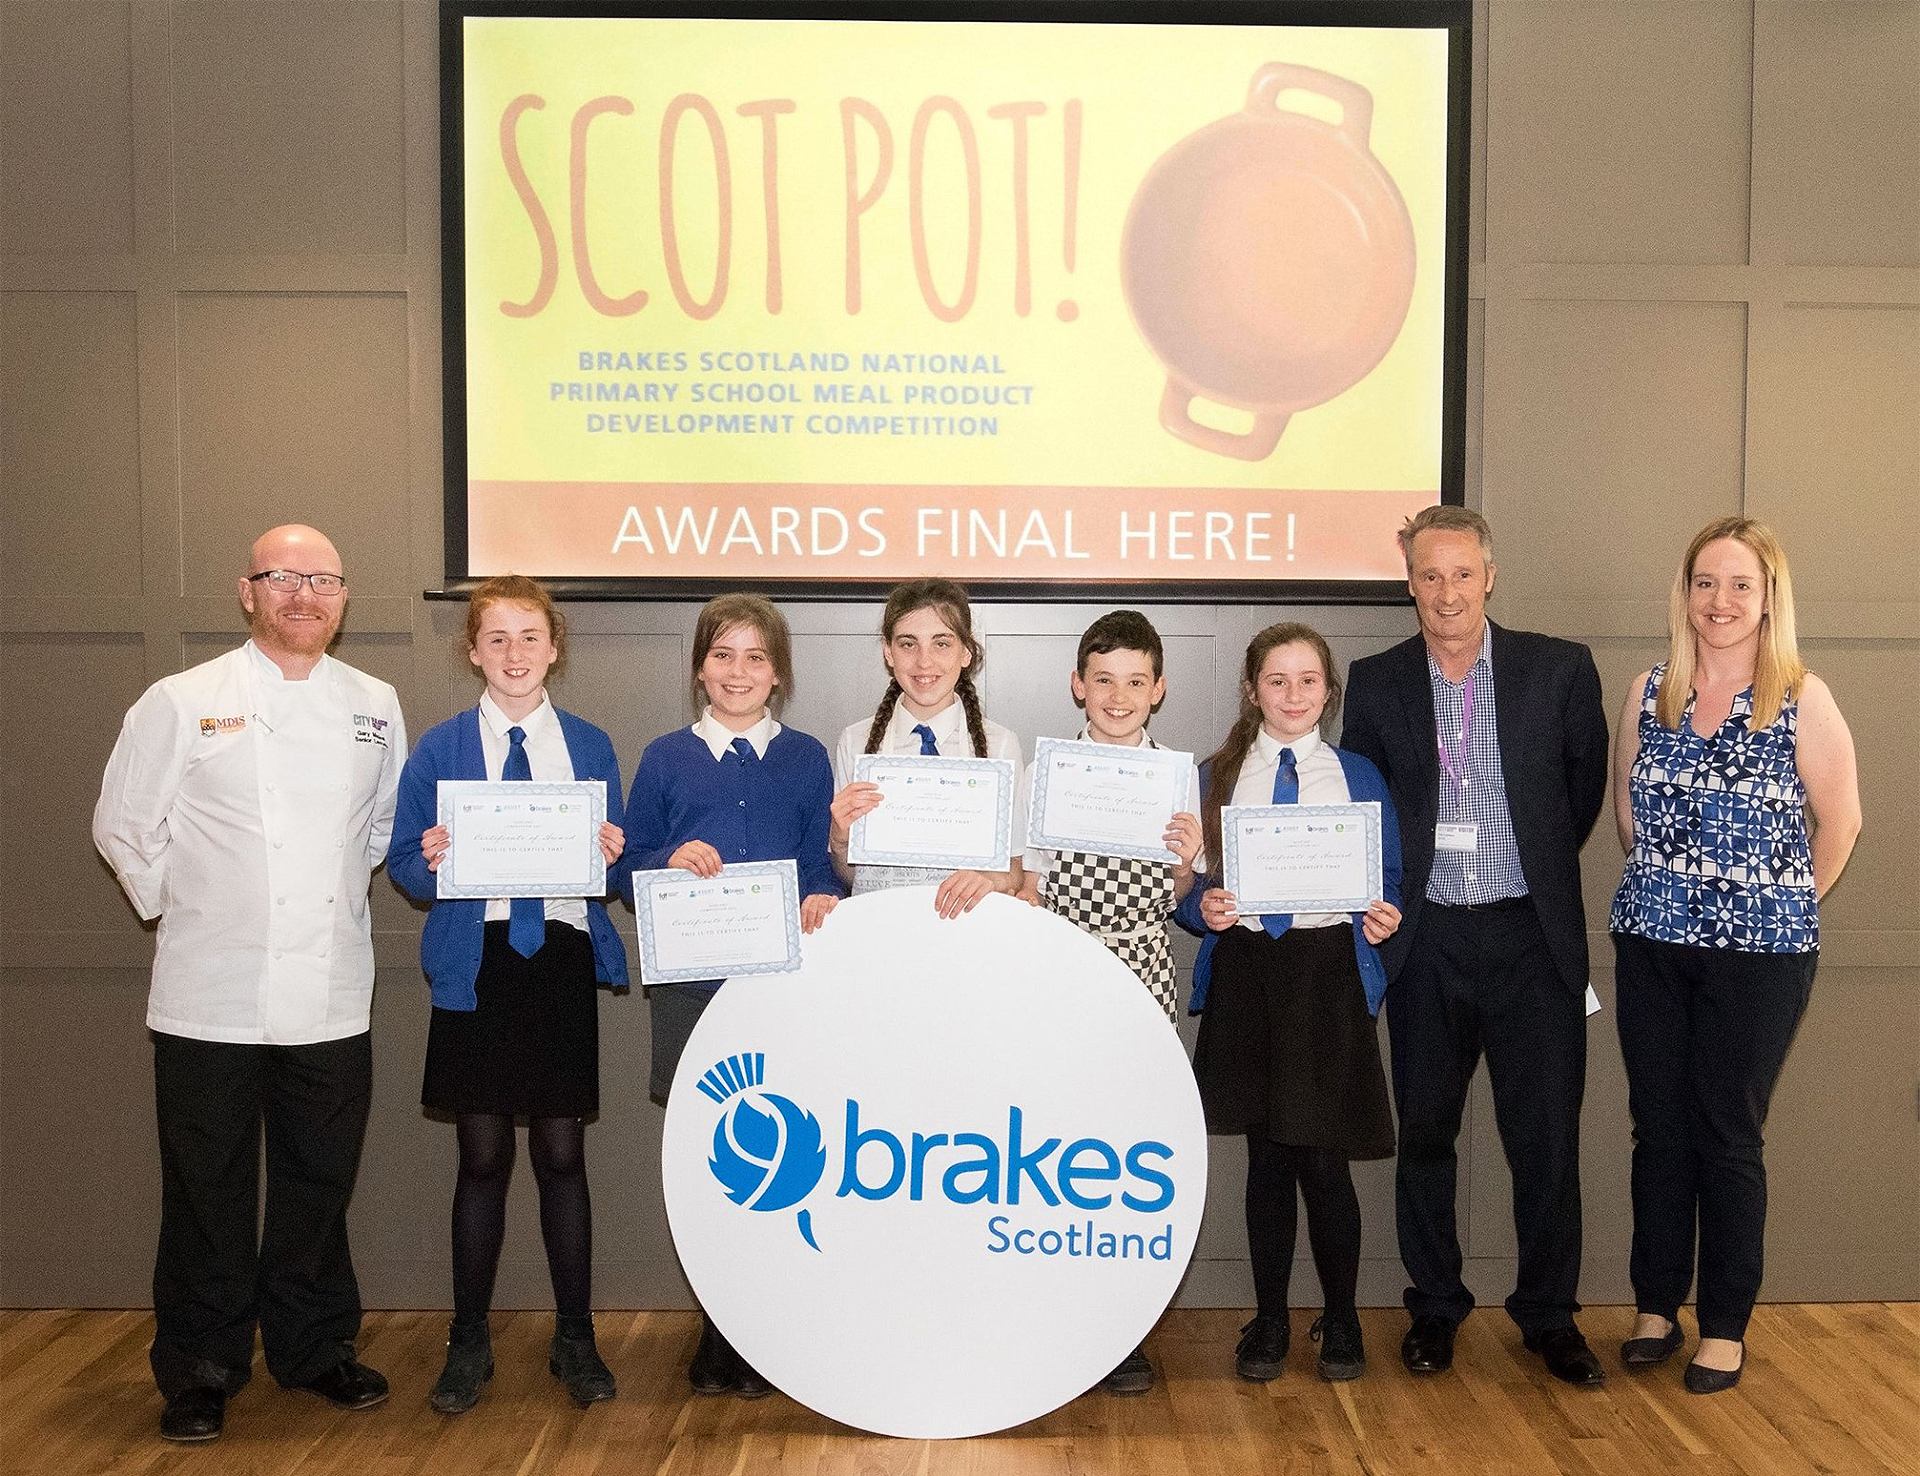 Brakes Scotland Pot Final Judging